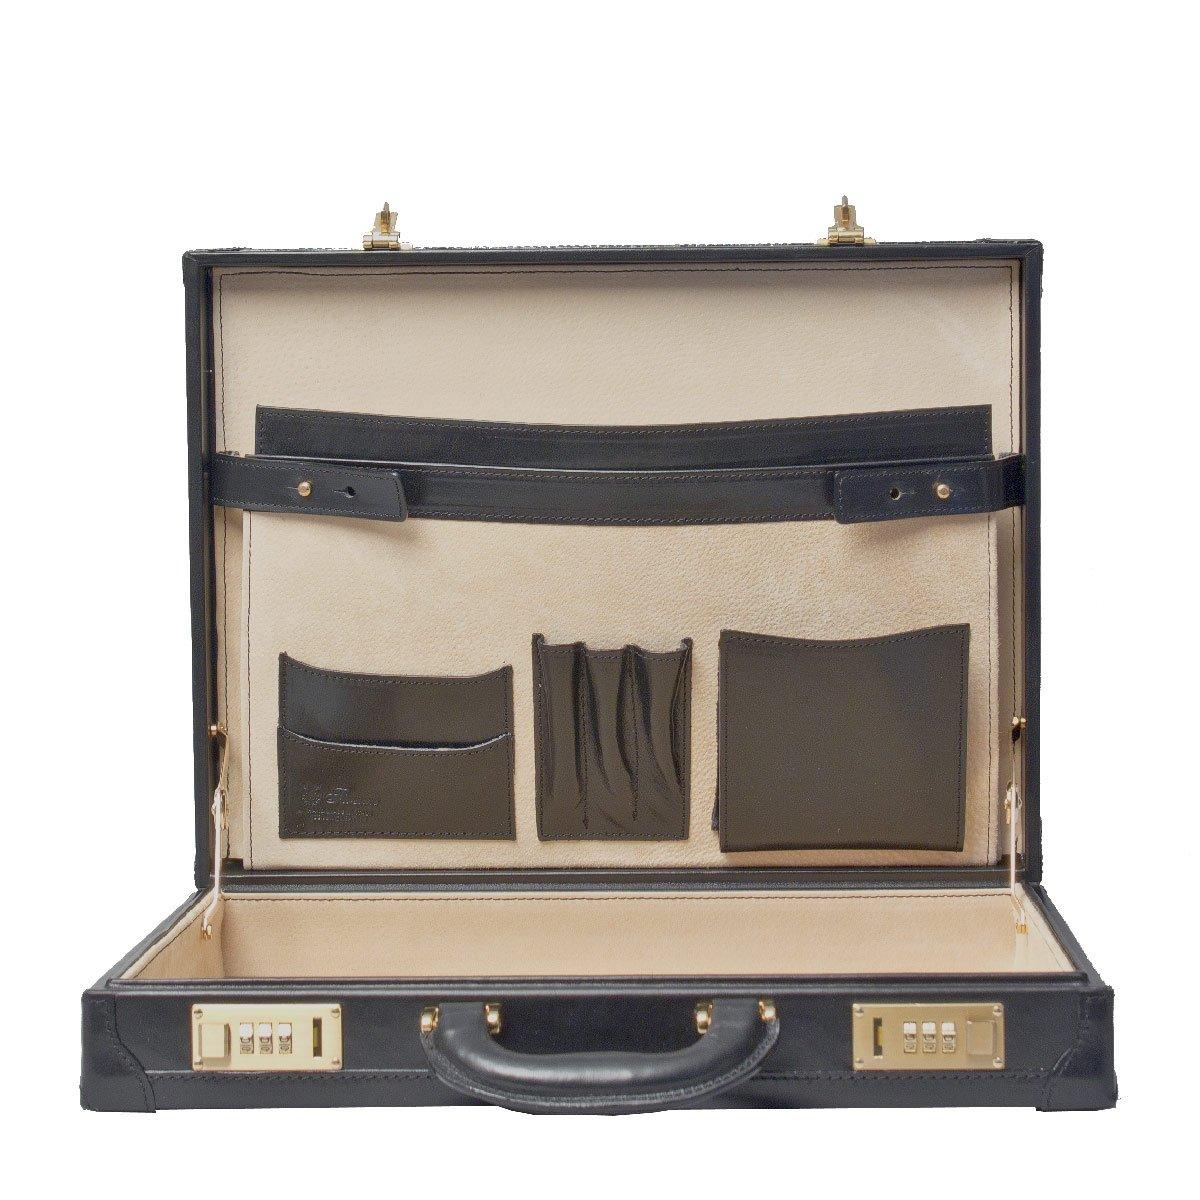 Maxwell Scott Luxury Black Attache Brief Case (The Scanno) - One Size